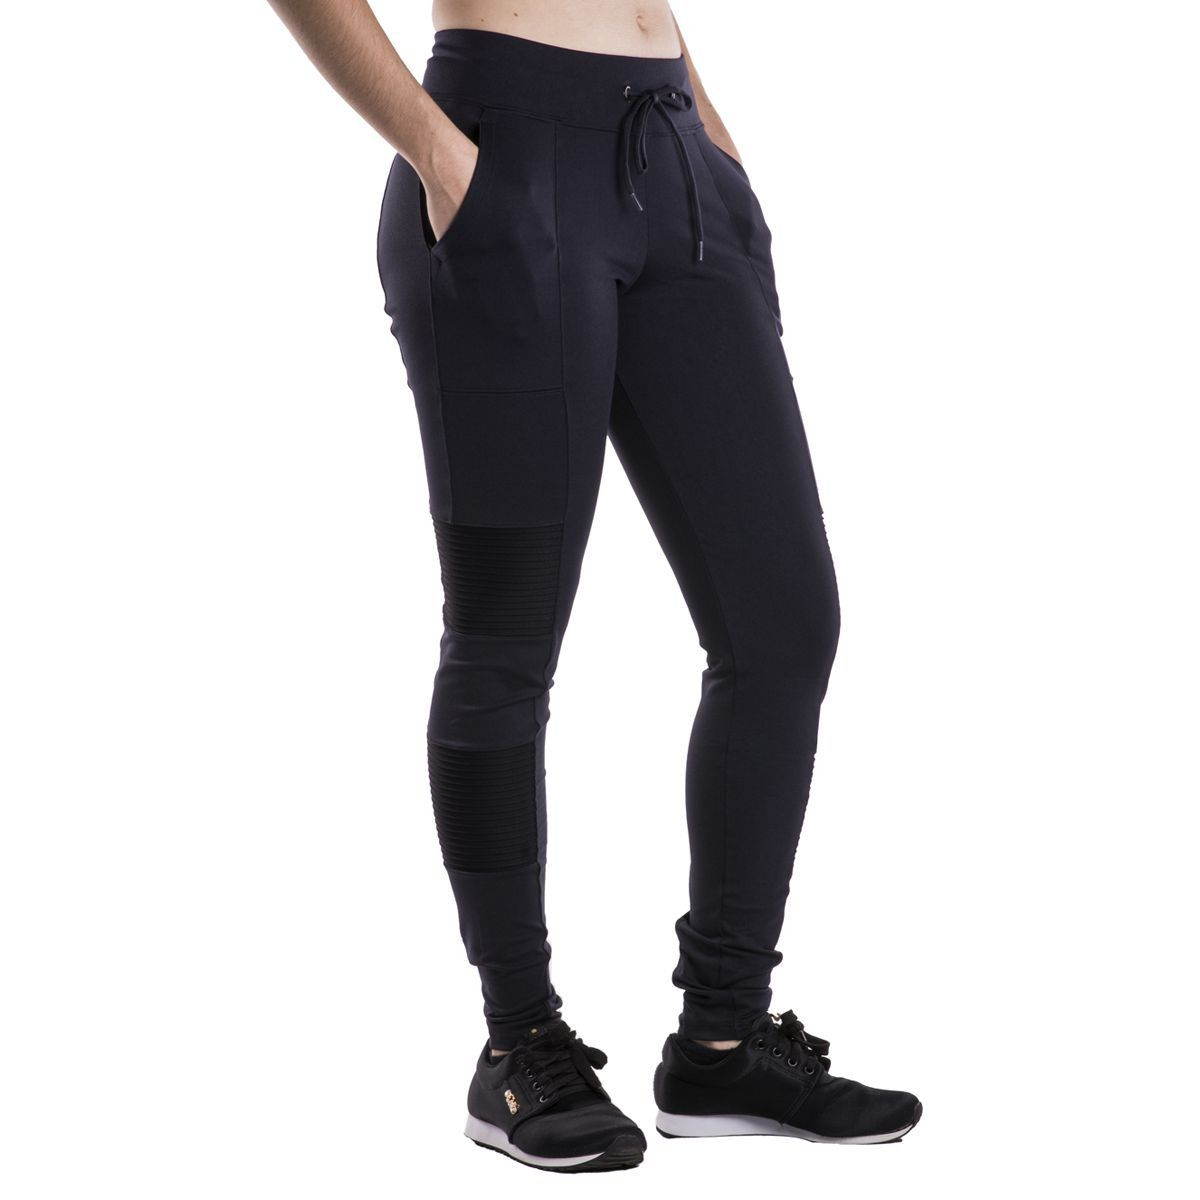 Calça Legging Lupo Sport Feminina Nervuras Fitness .